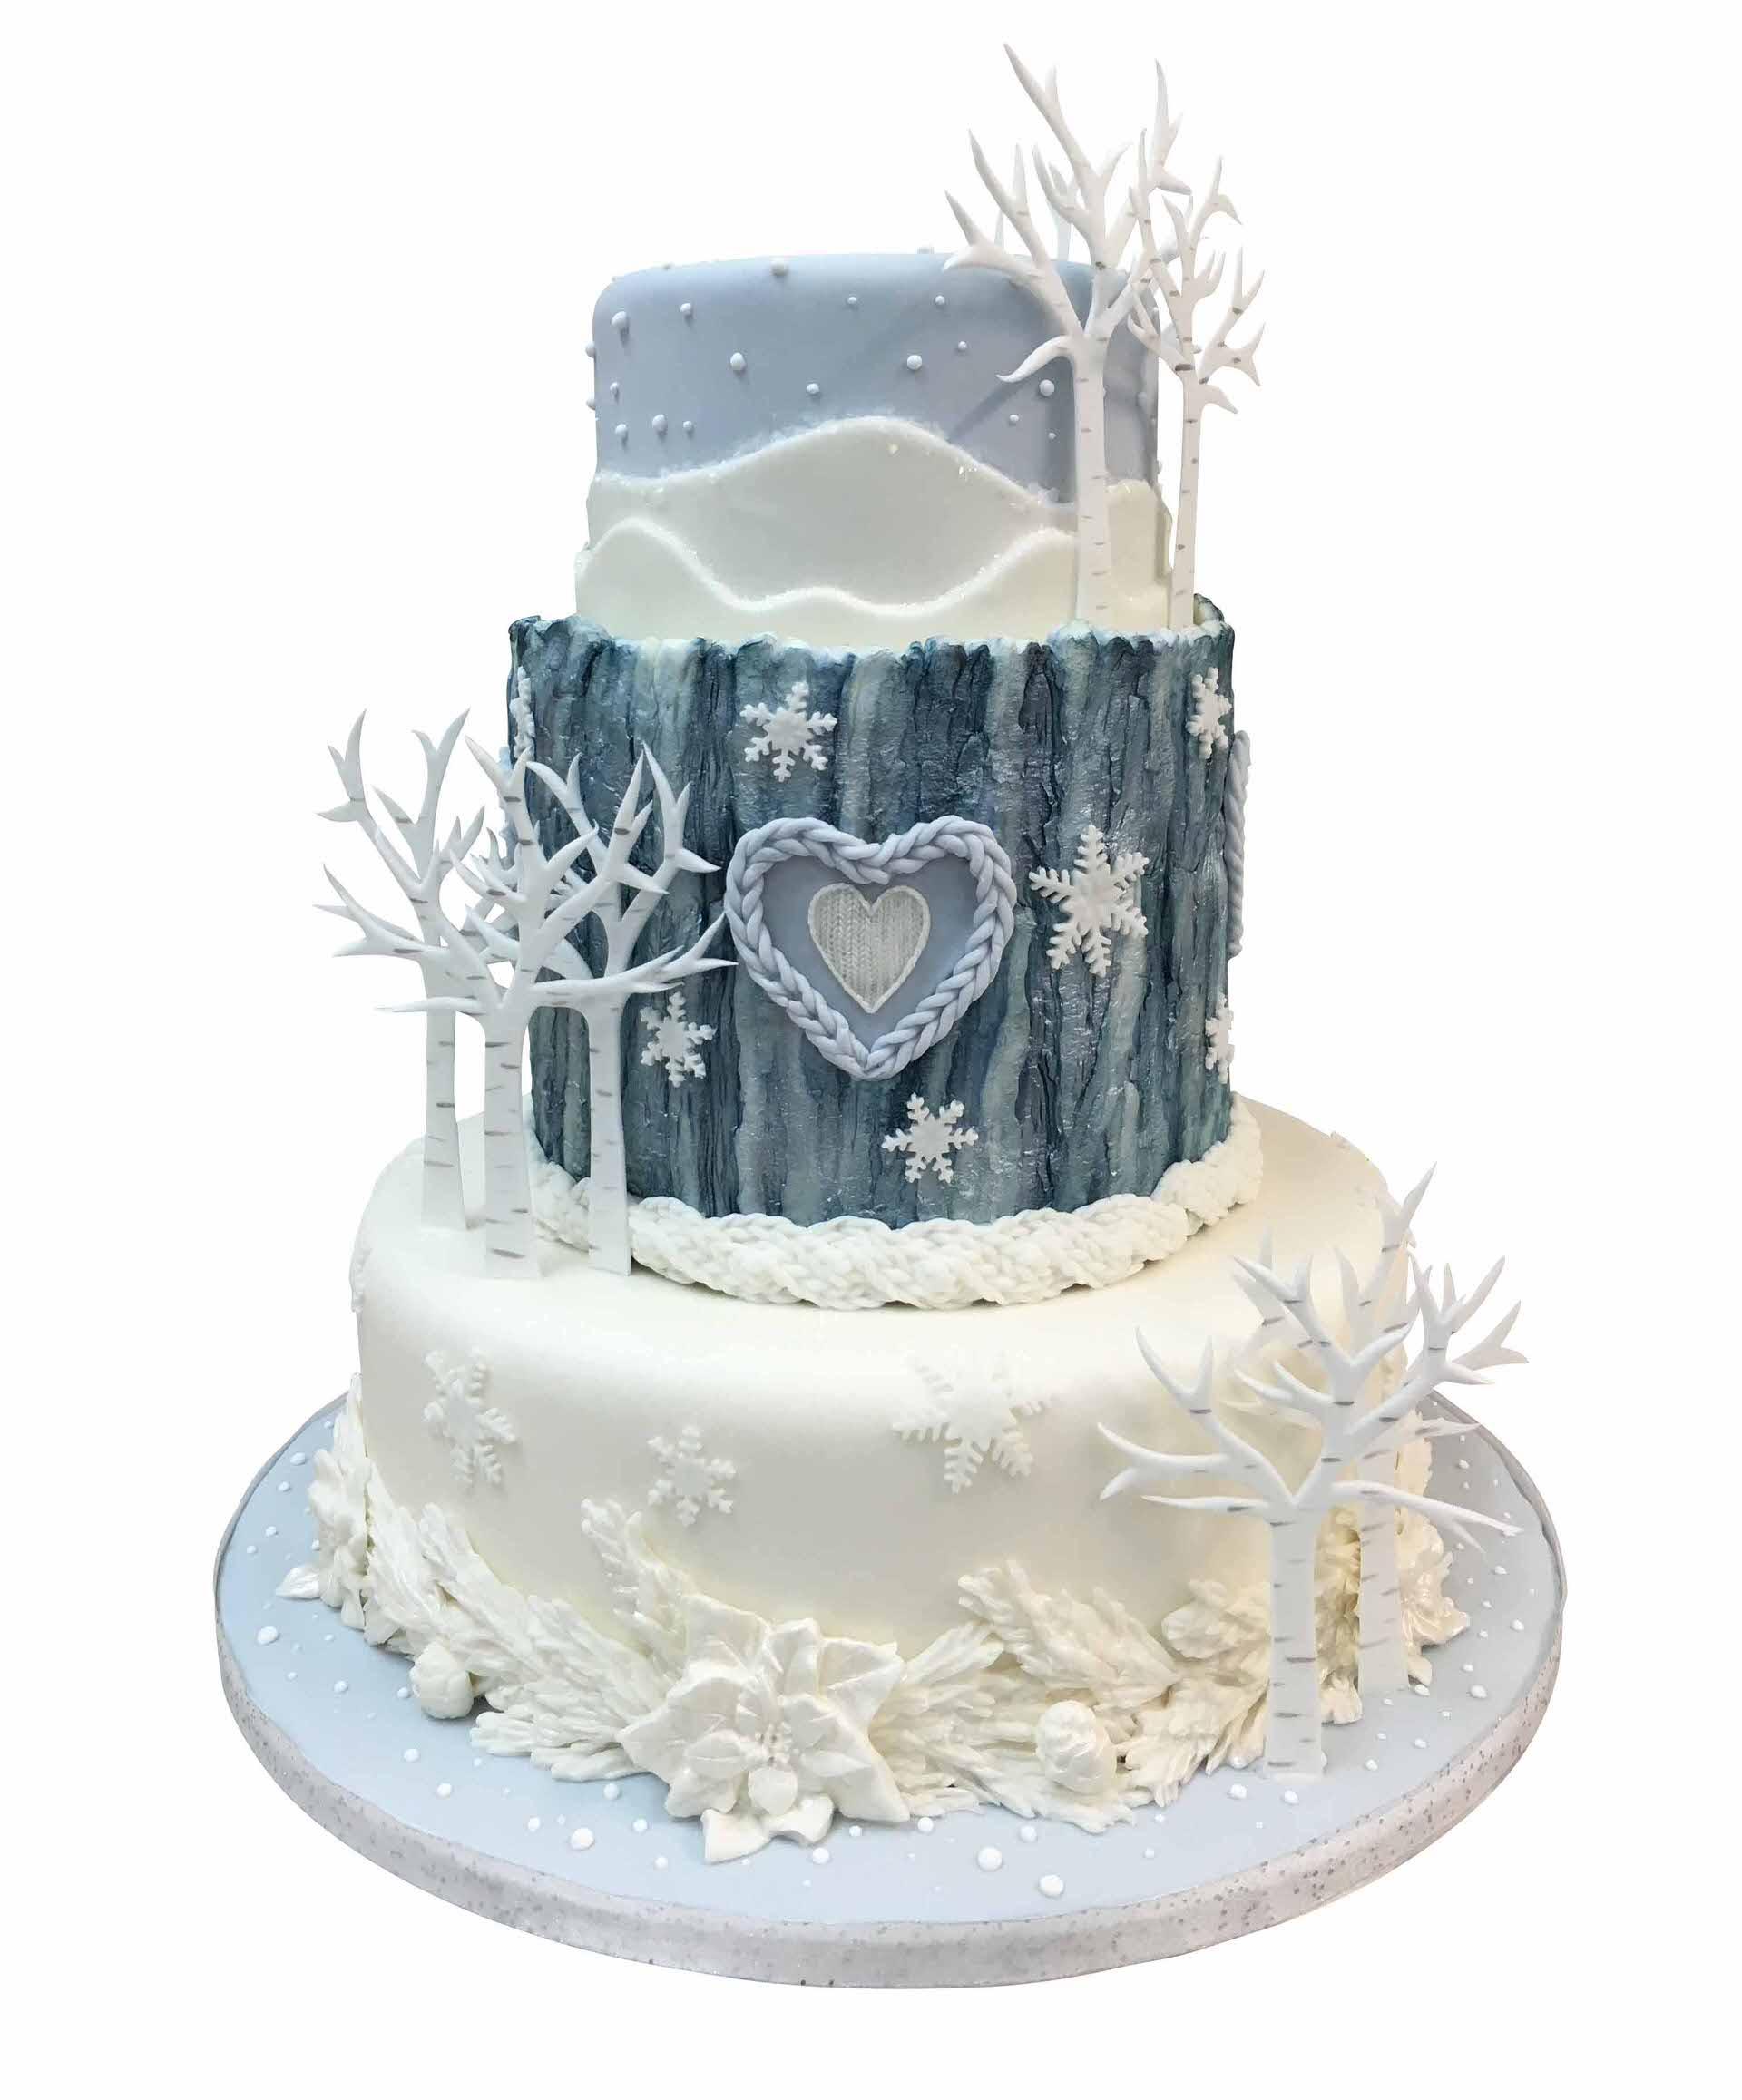 Rustic Winter Cake Tutorial | Cake Masters Magazine